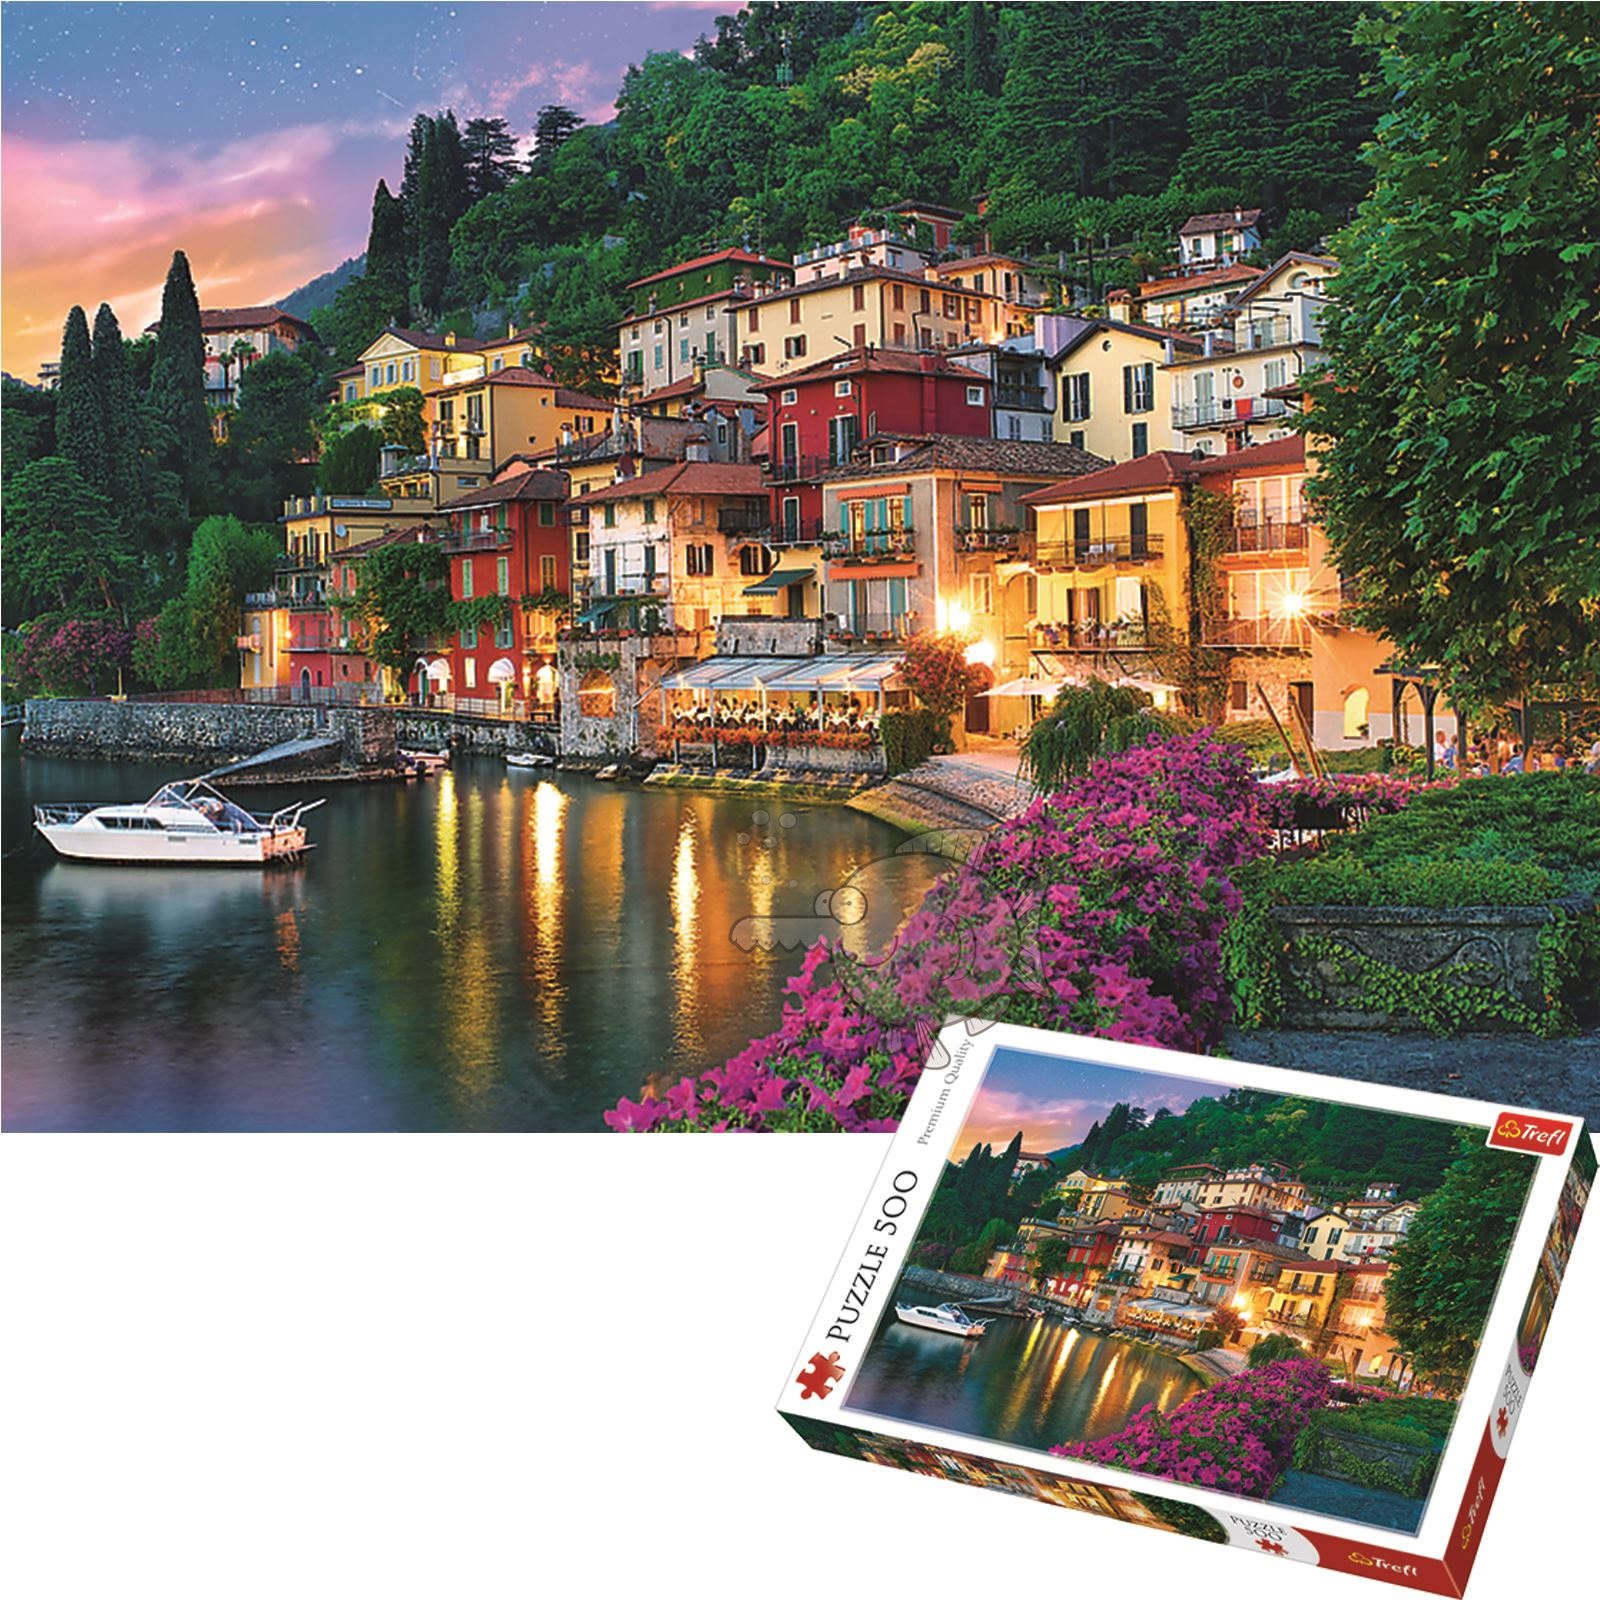 Trefl-300-500-1000-1500-2000-3000-4000-6000-Piece-Jigsaw-Puzzle-Landscapes-City thumbnail 175